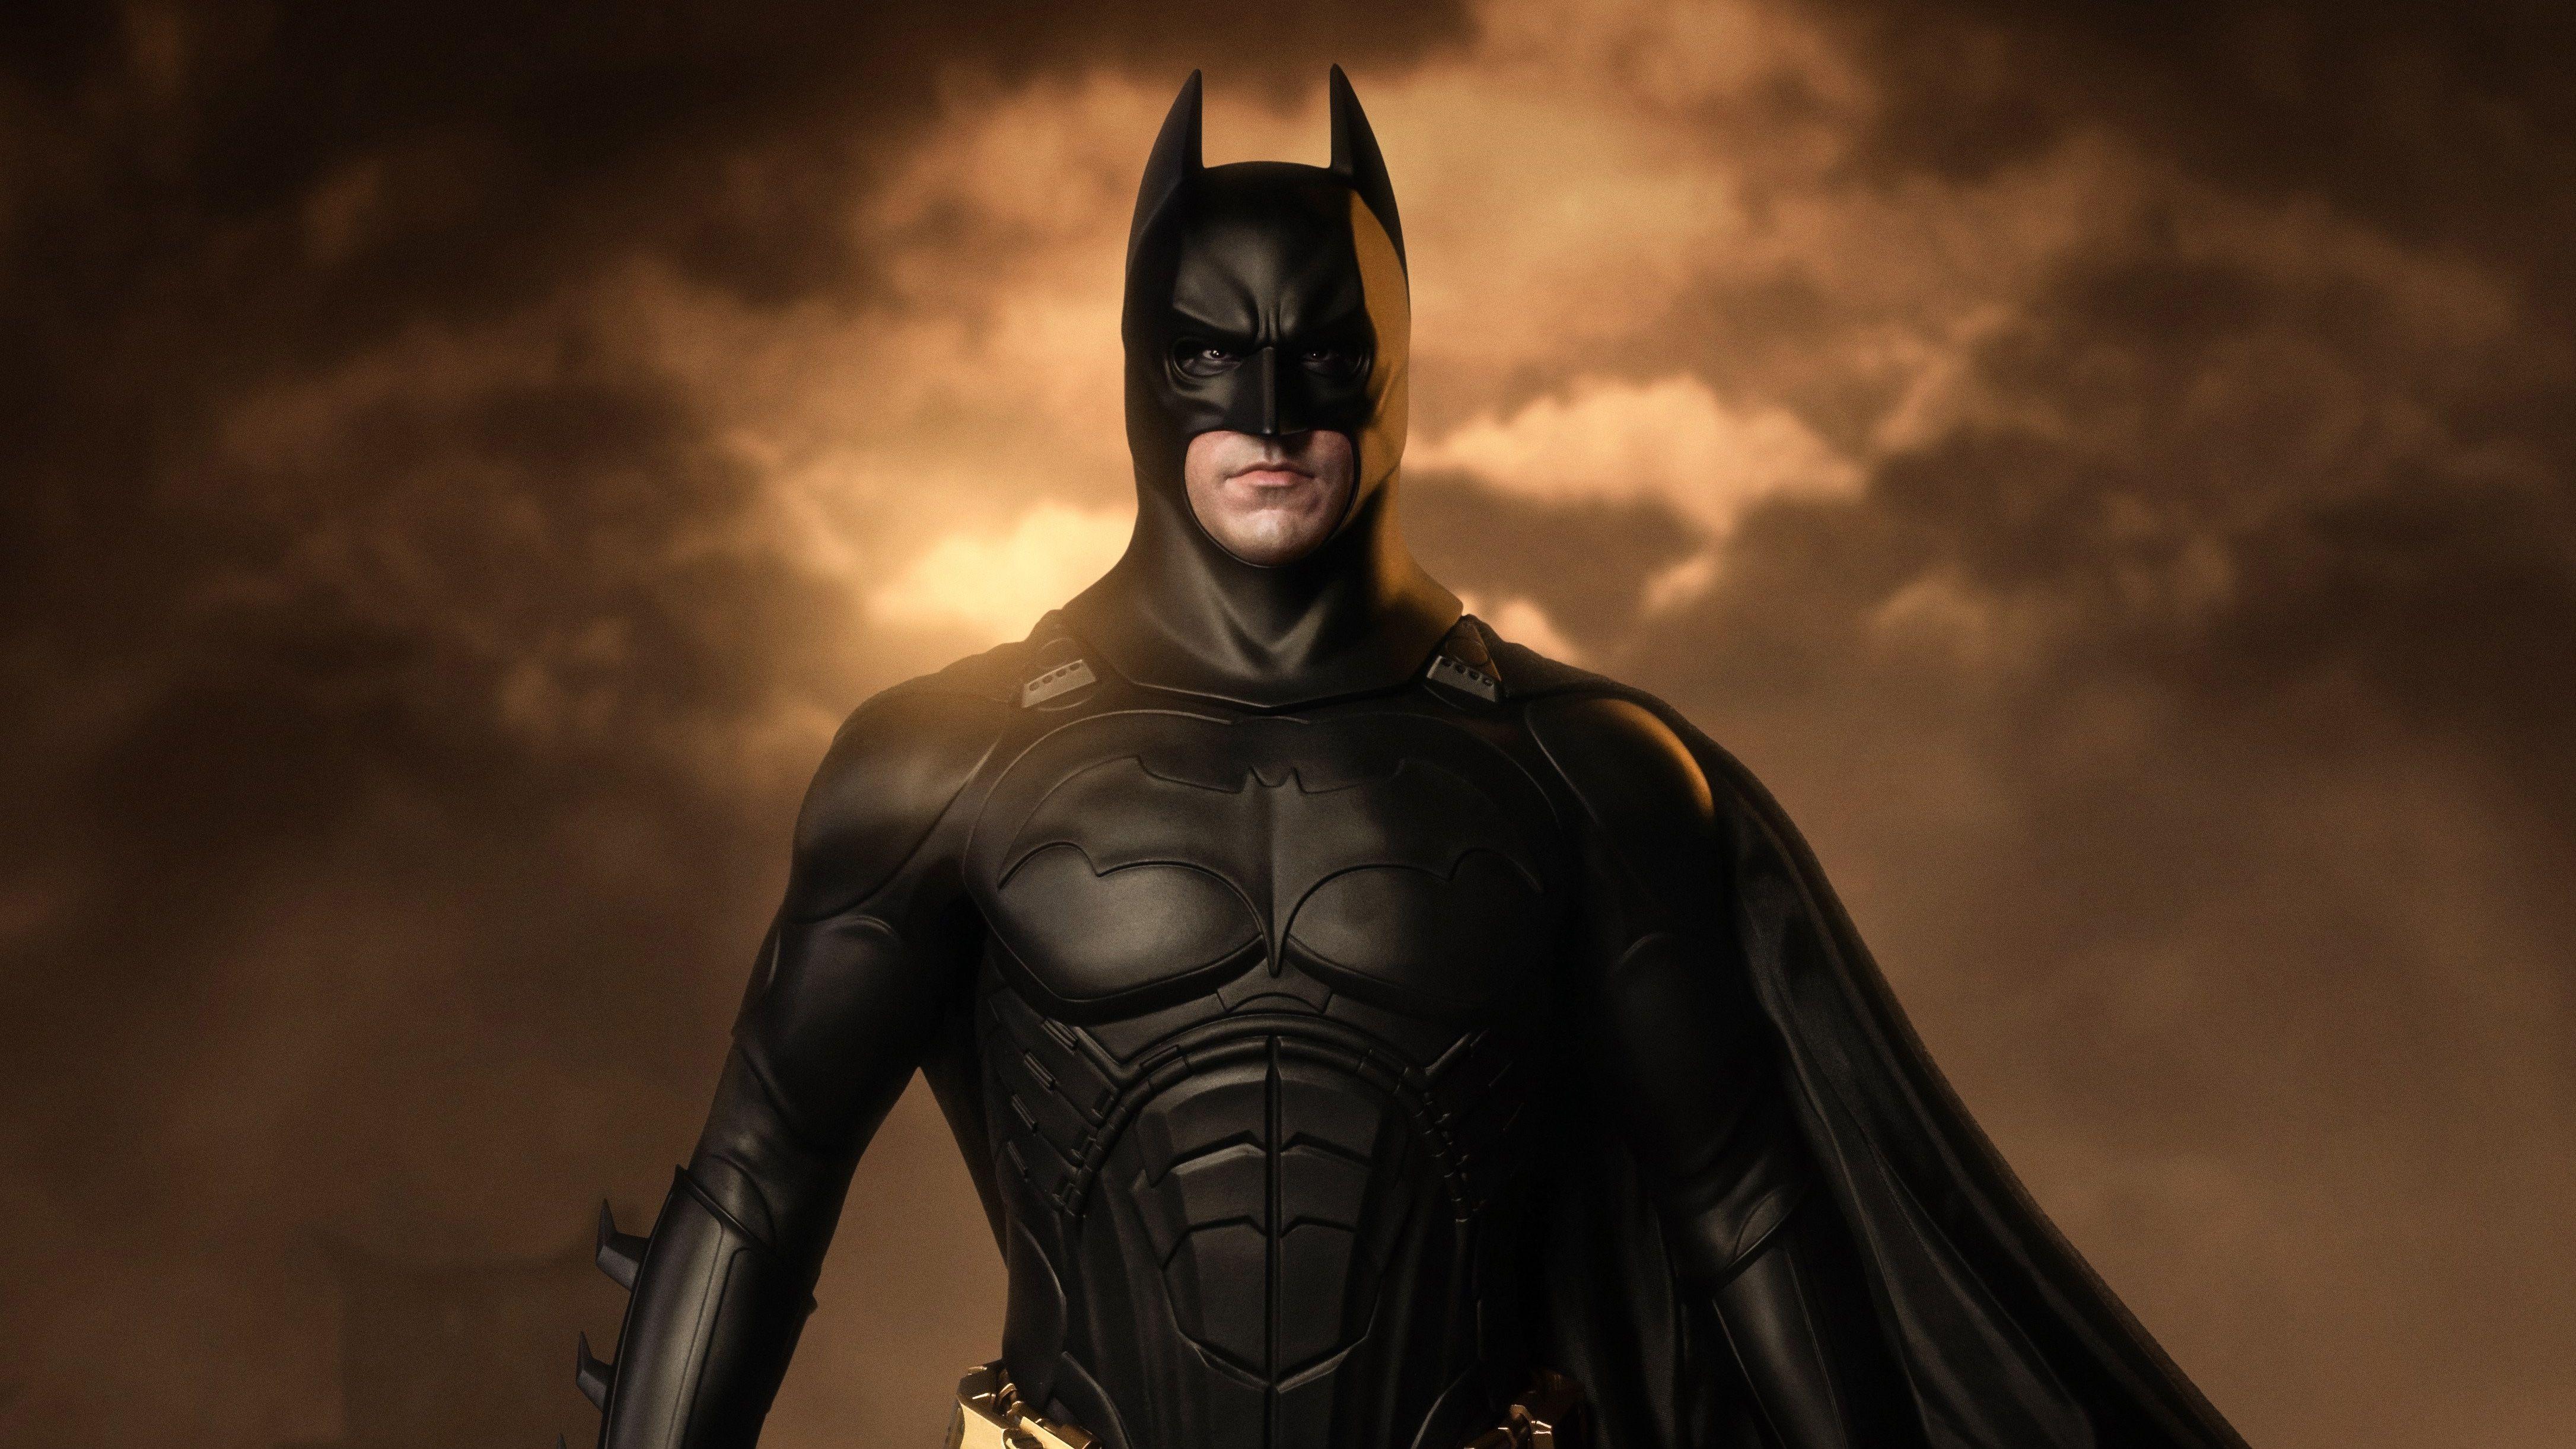 Batman Begins Wallpapers Top Free Batman Begins